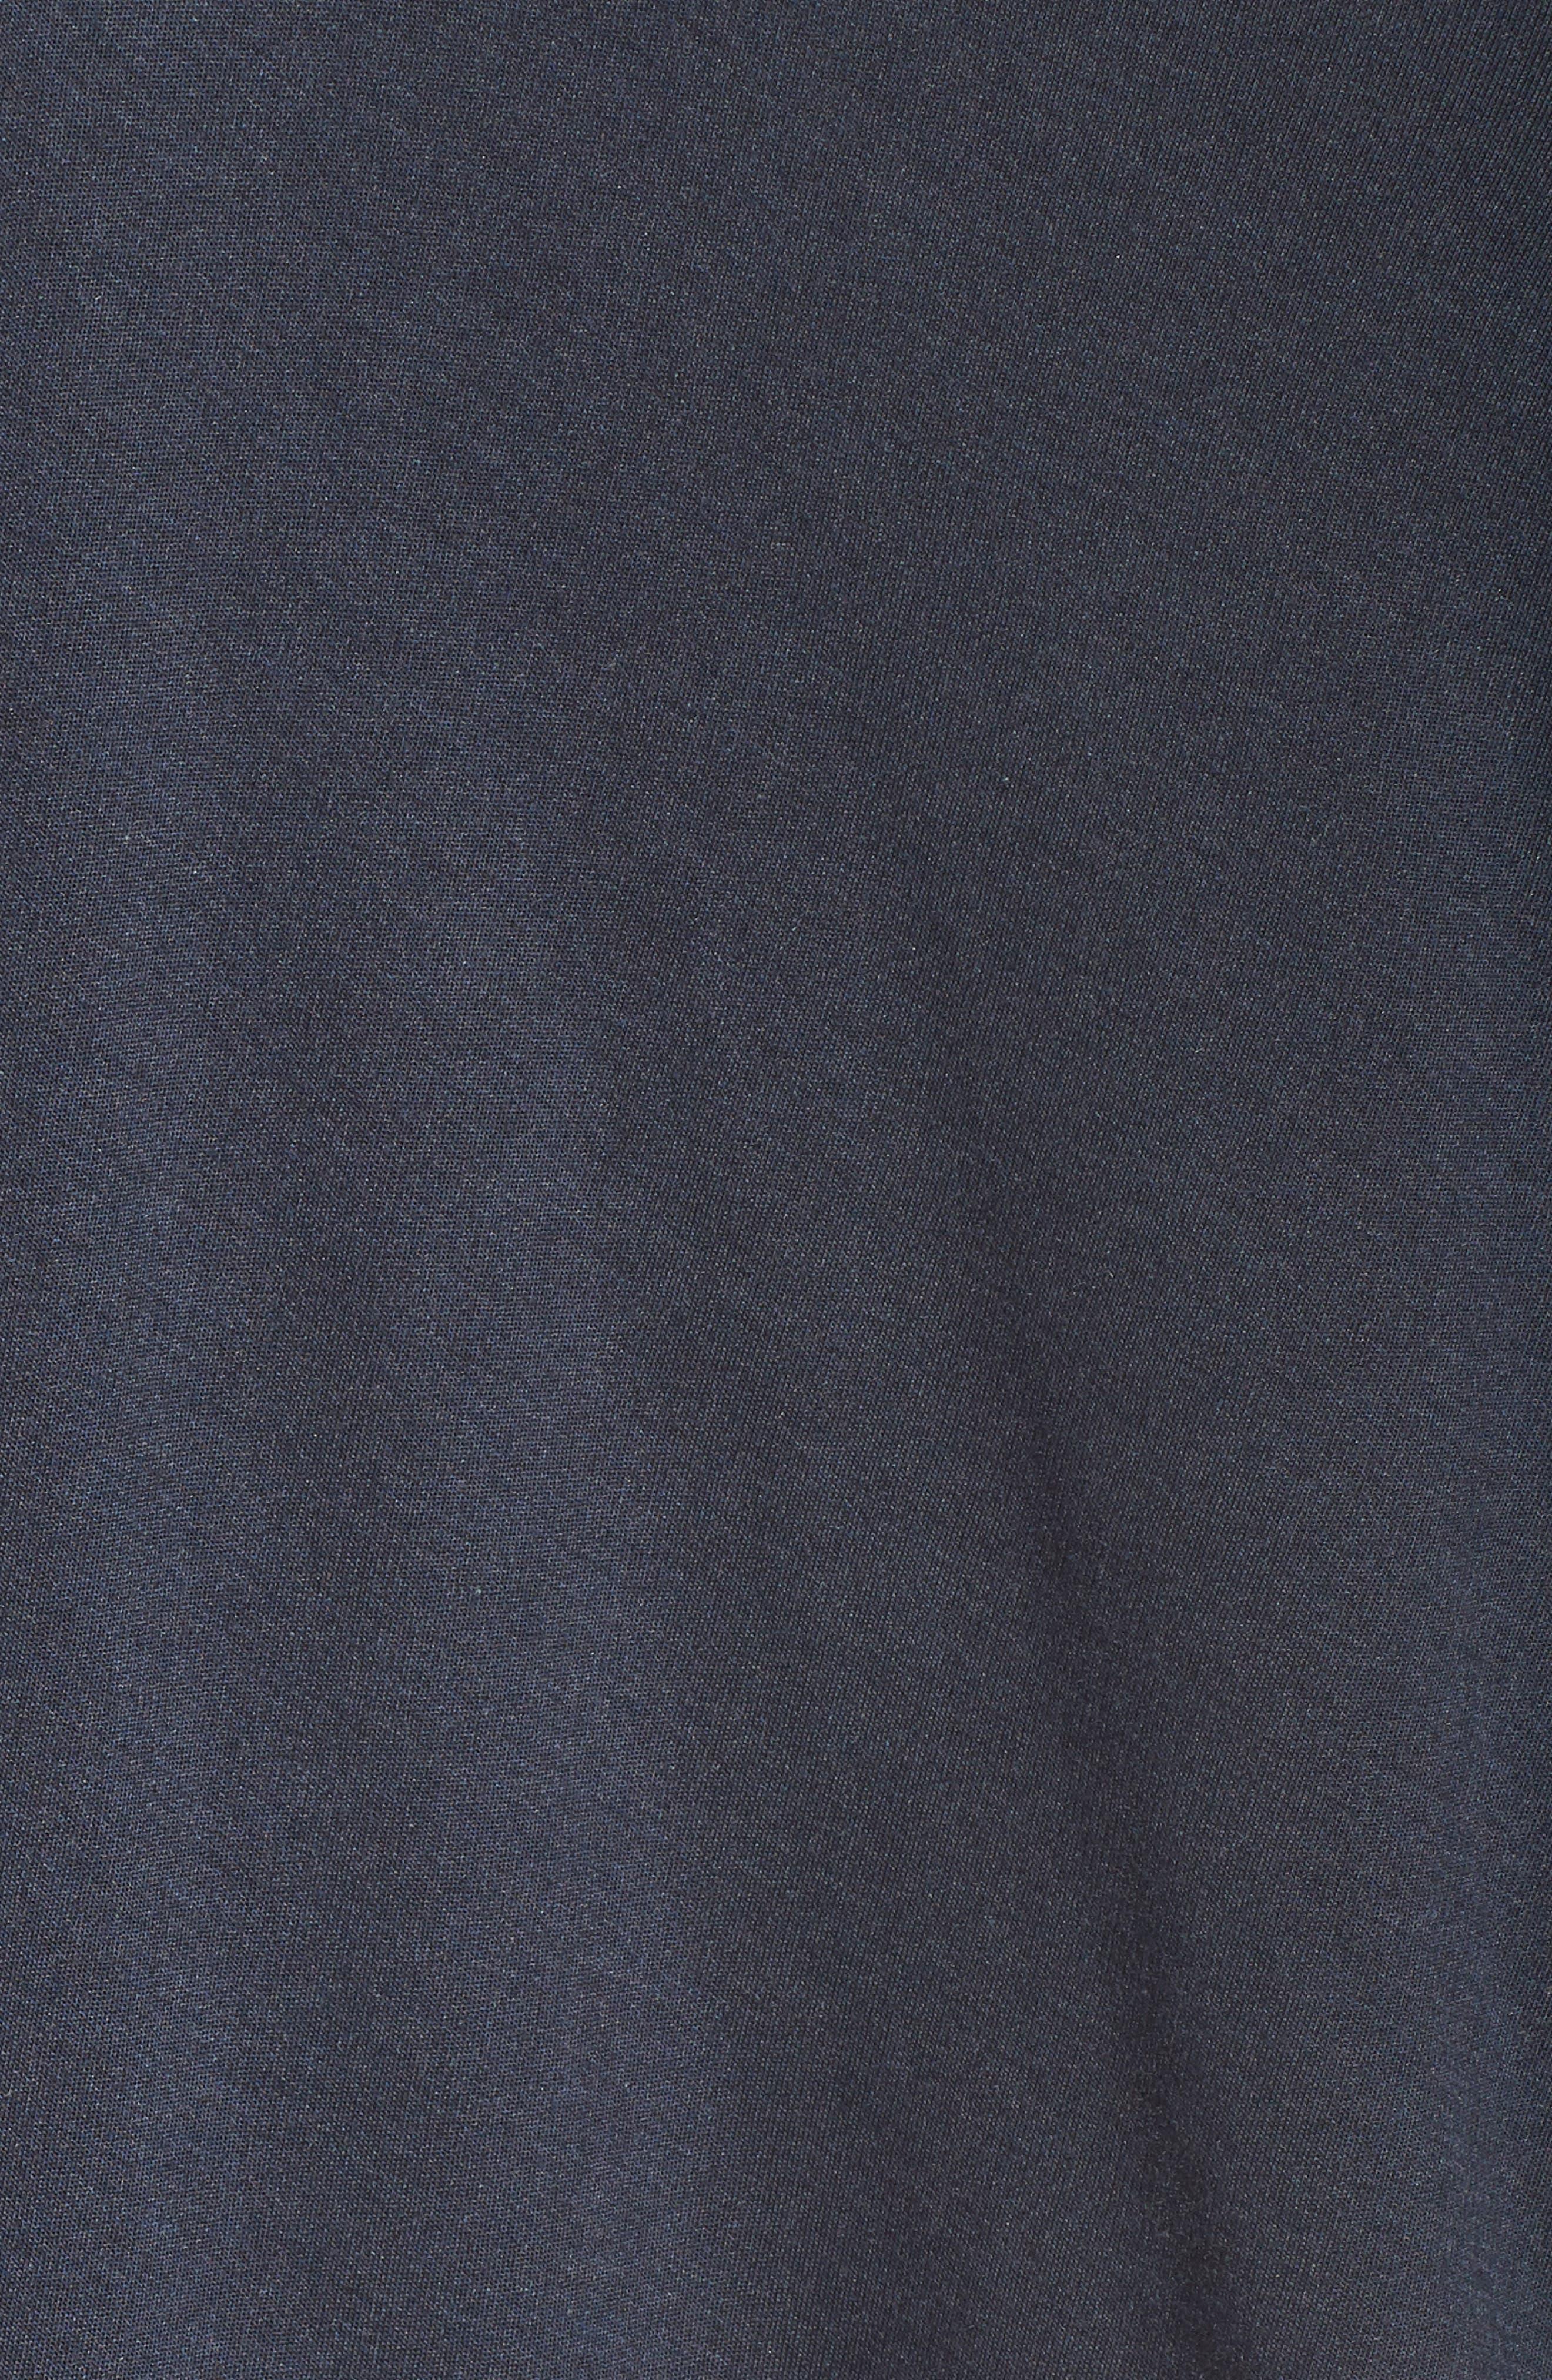 Long Cardigan,                             Alternate thumbnail 5, color,                             NAVY